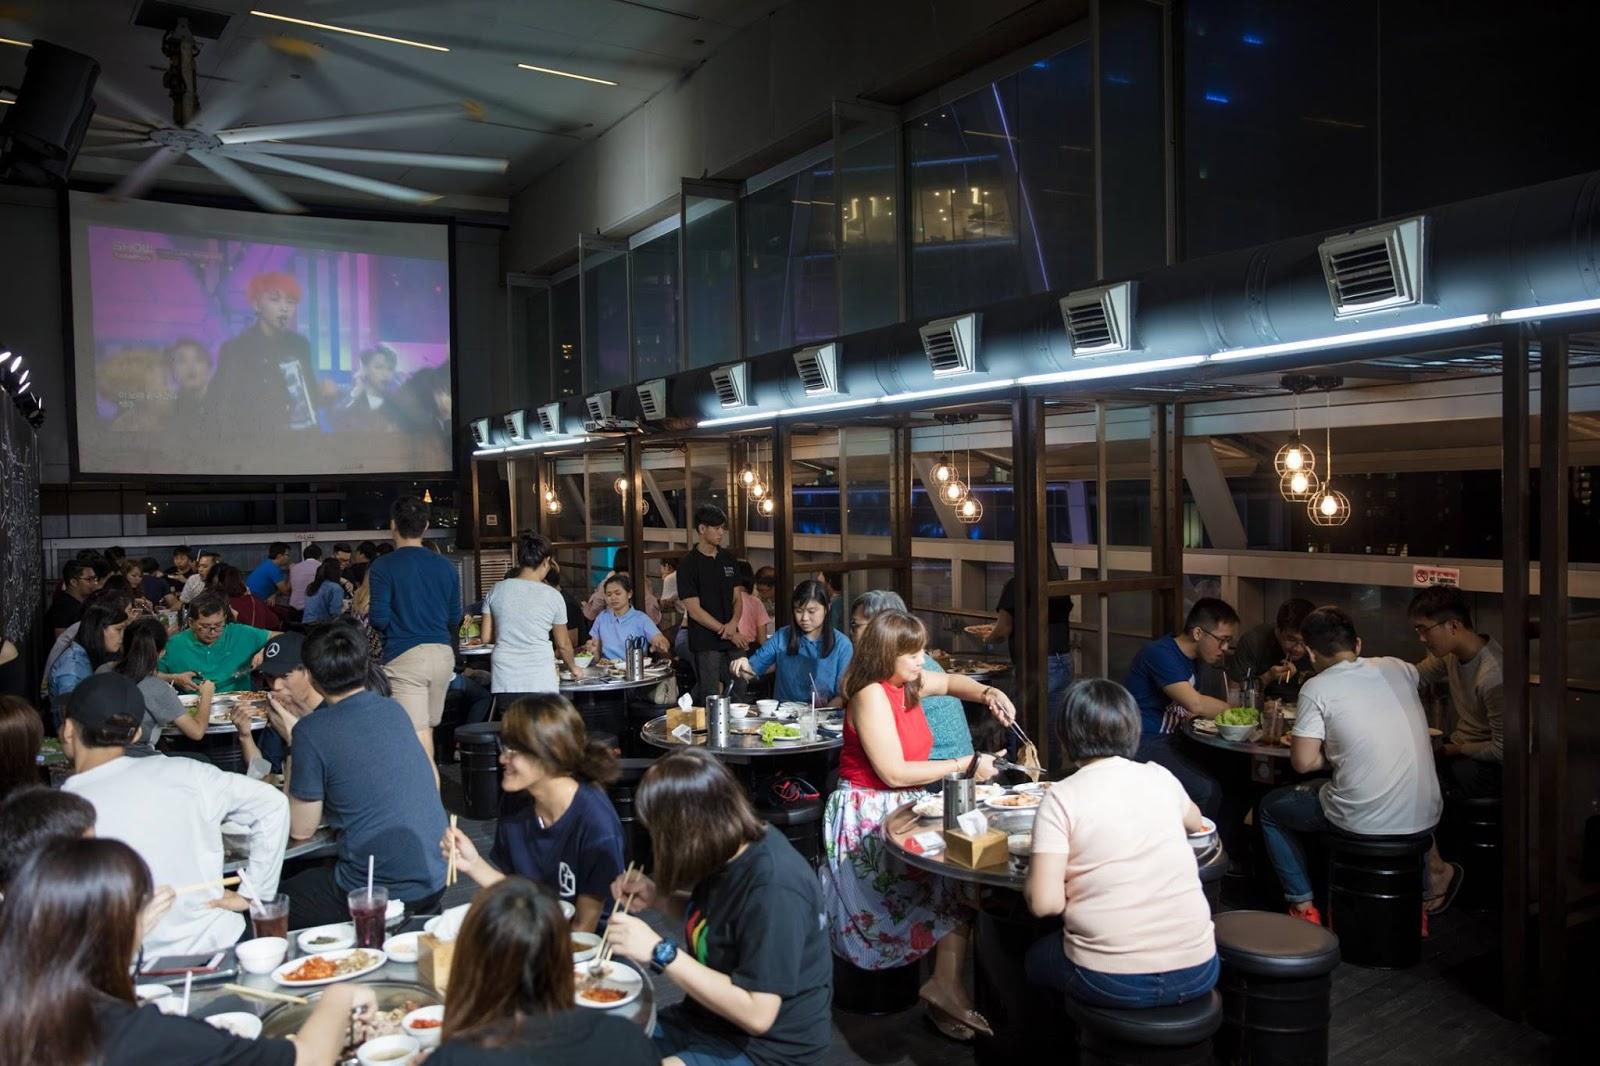 k.cook kpop screening